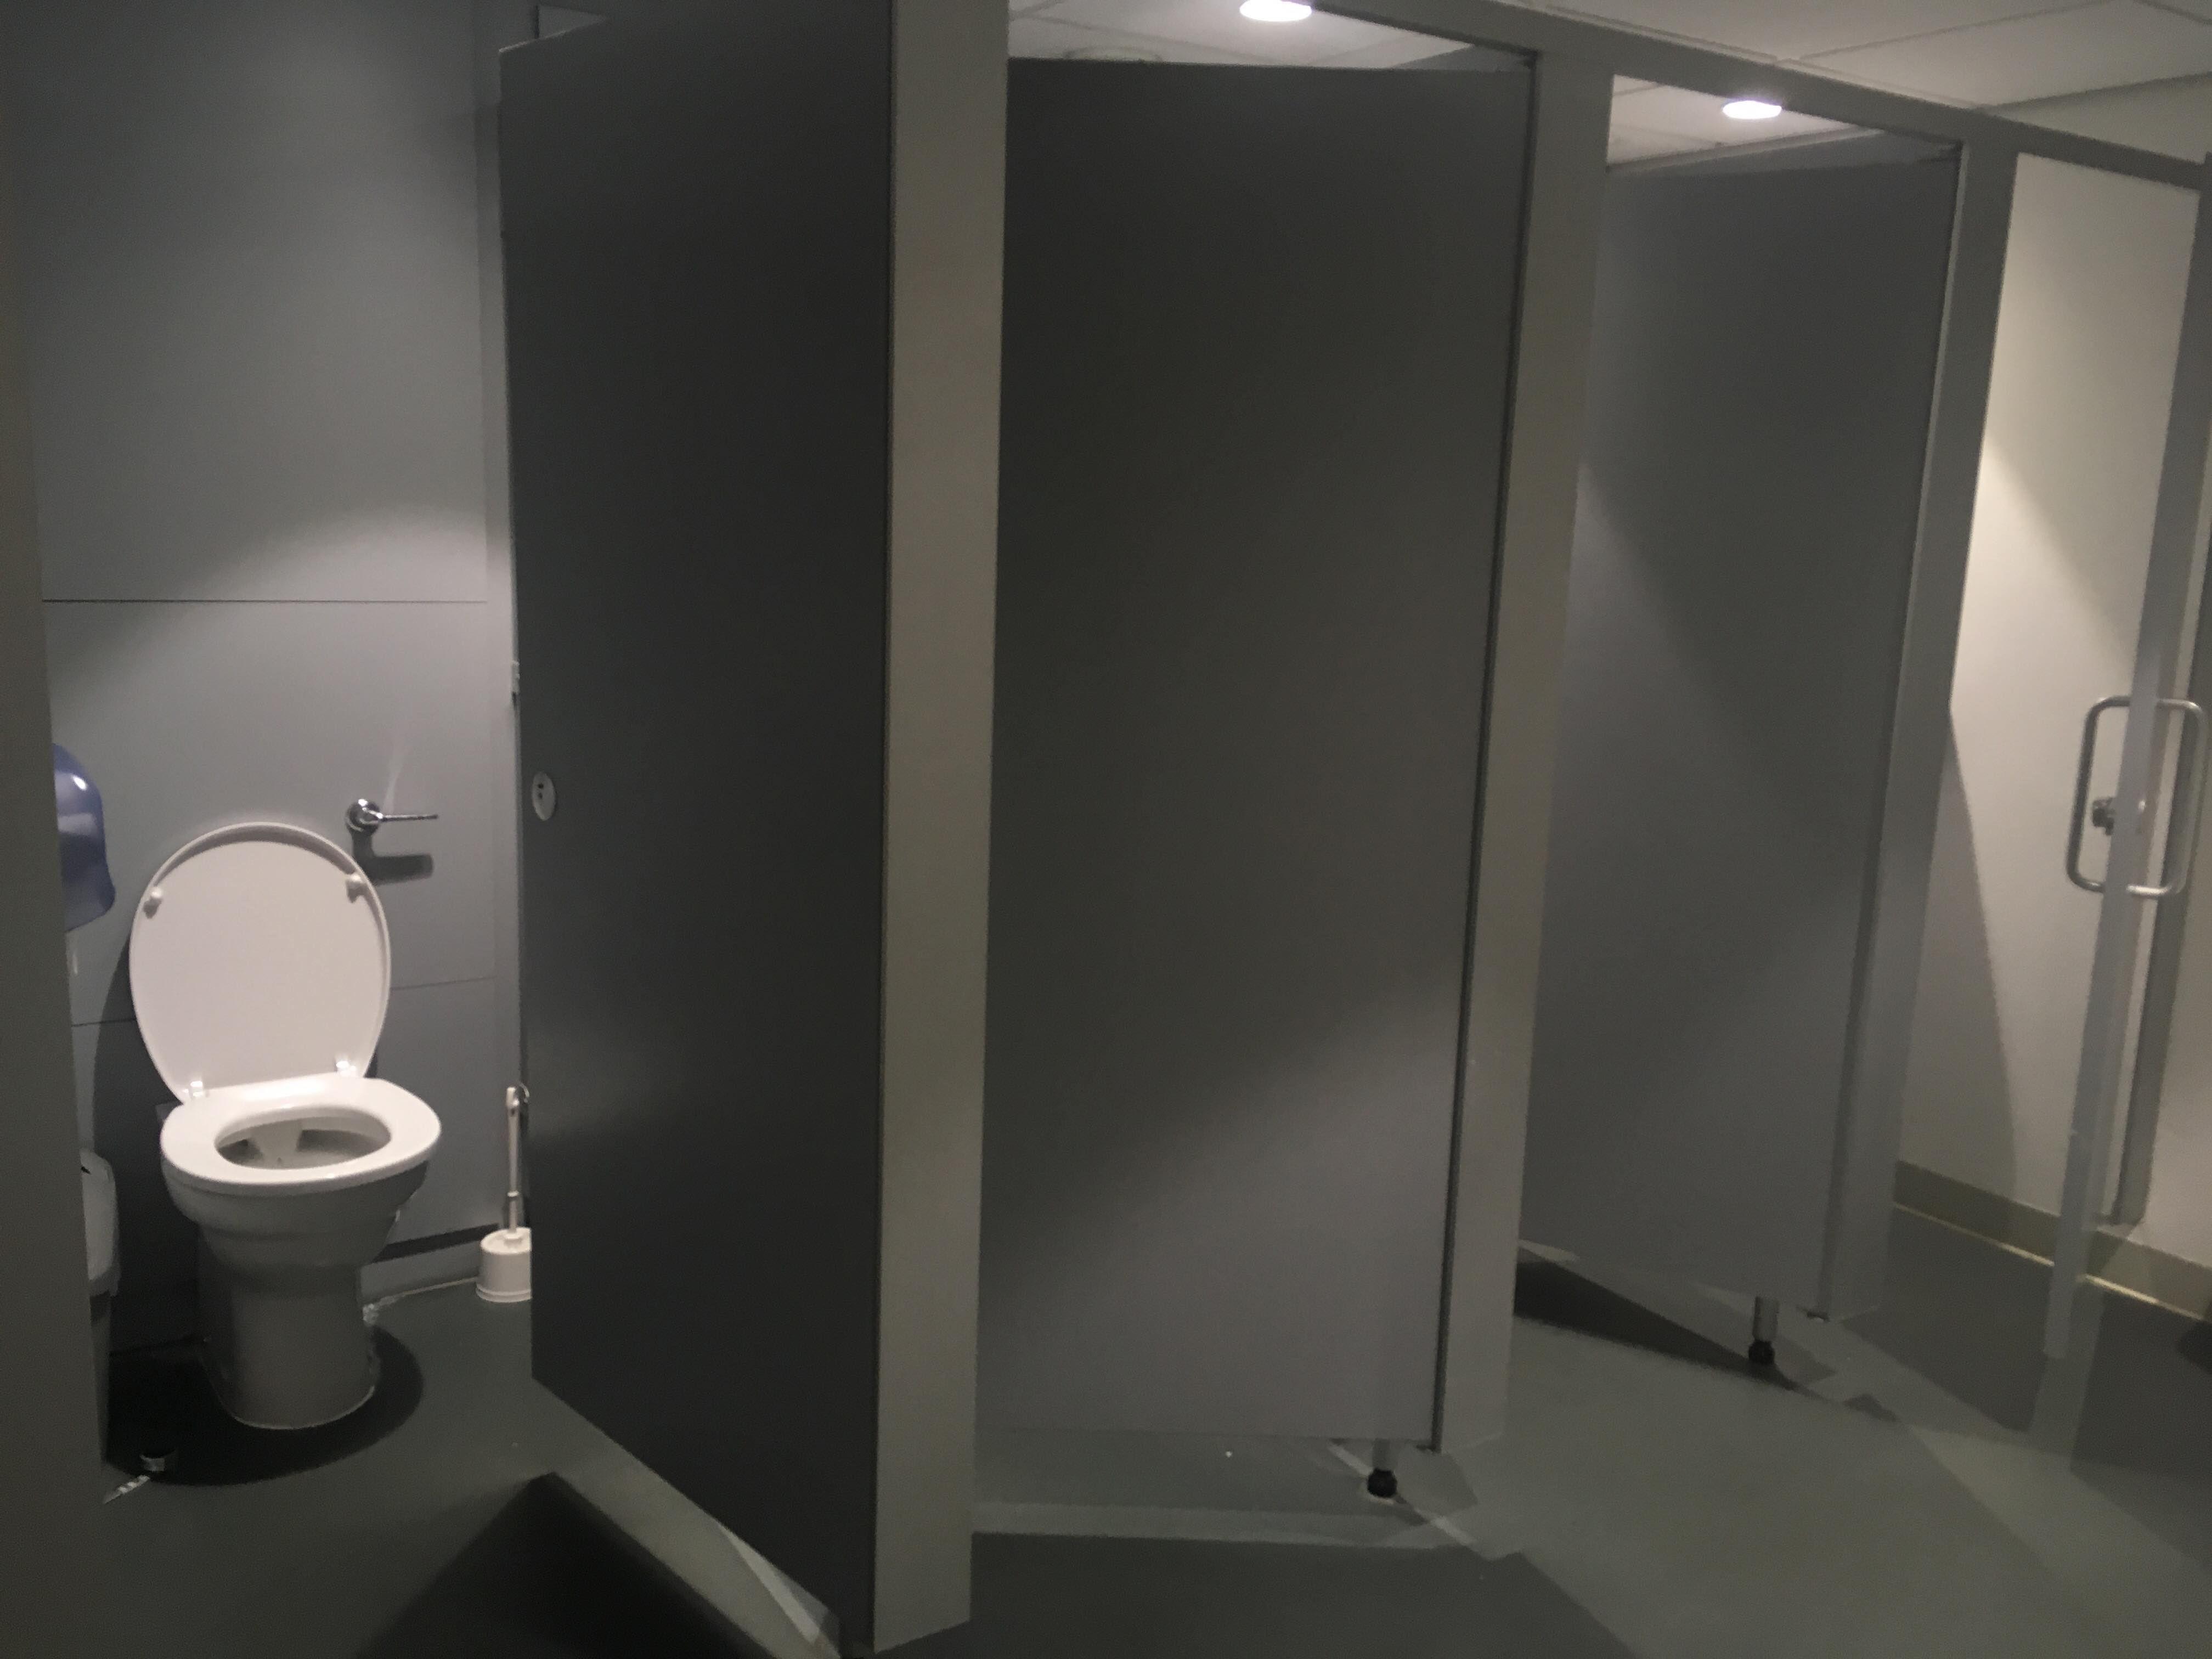 Image may contain: Room, Interior Design, Indoors, Bathroom, Toilet